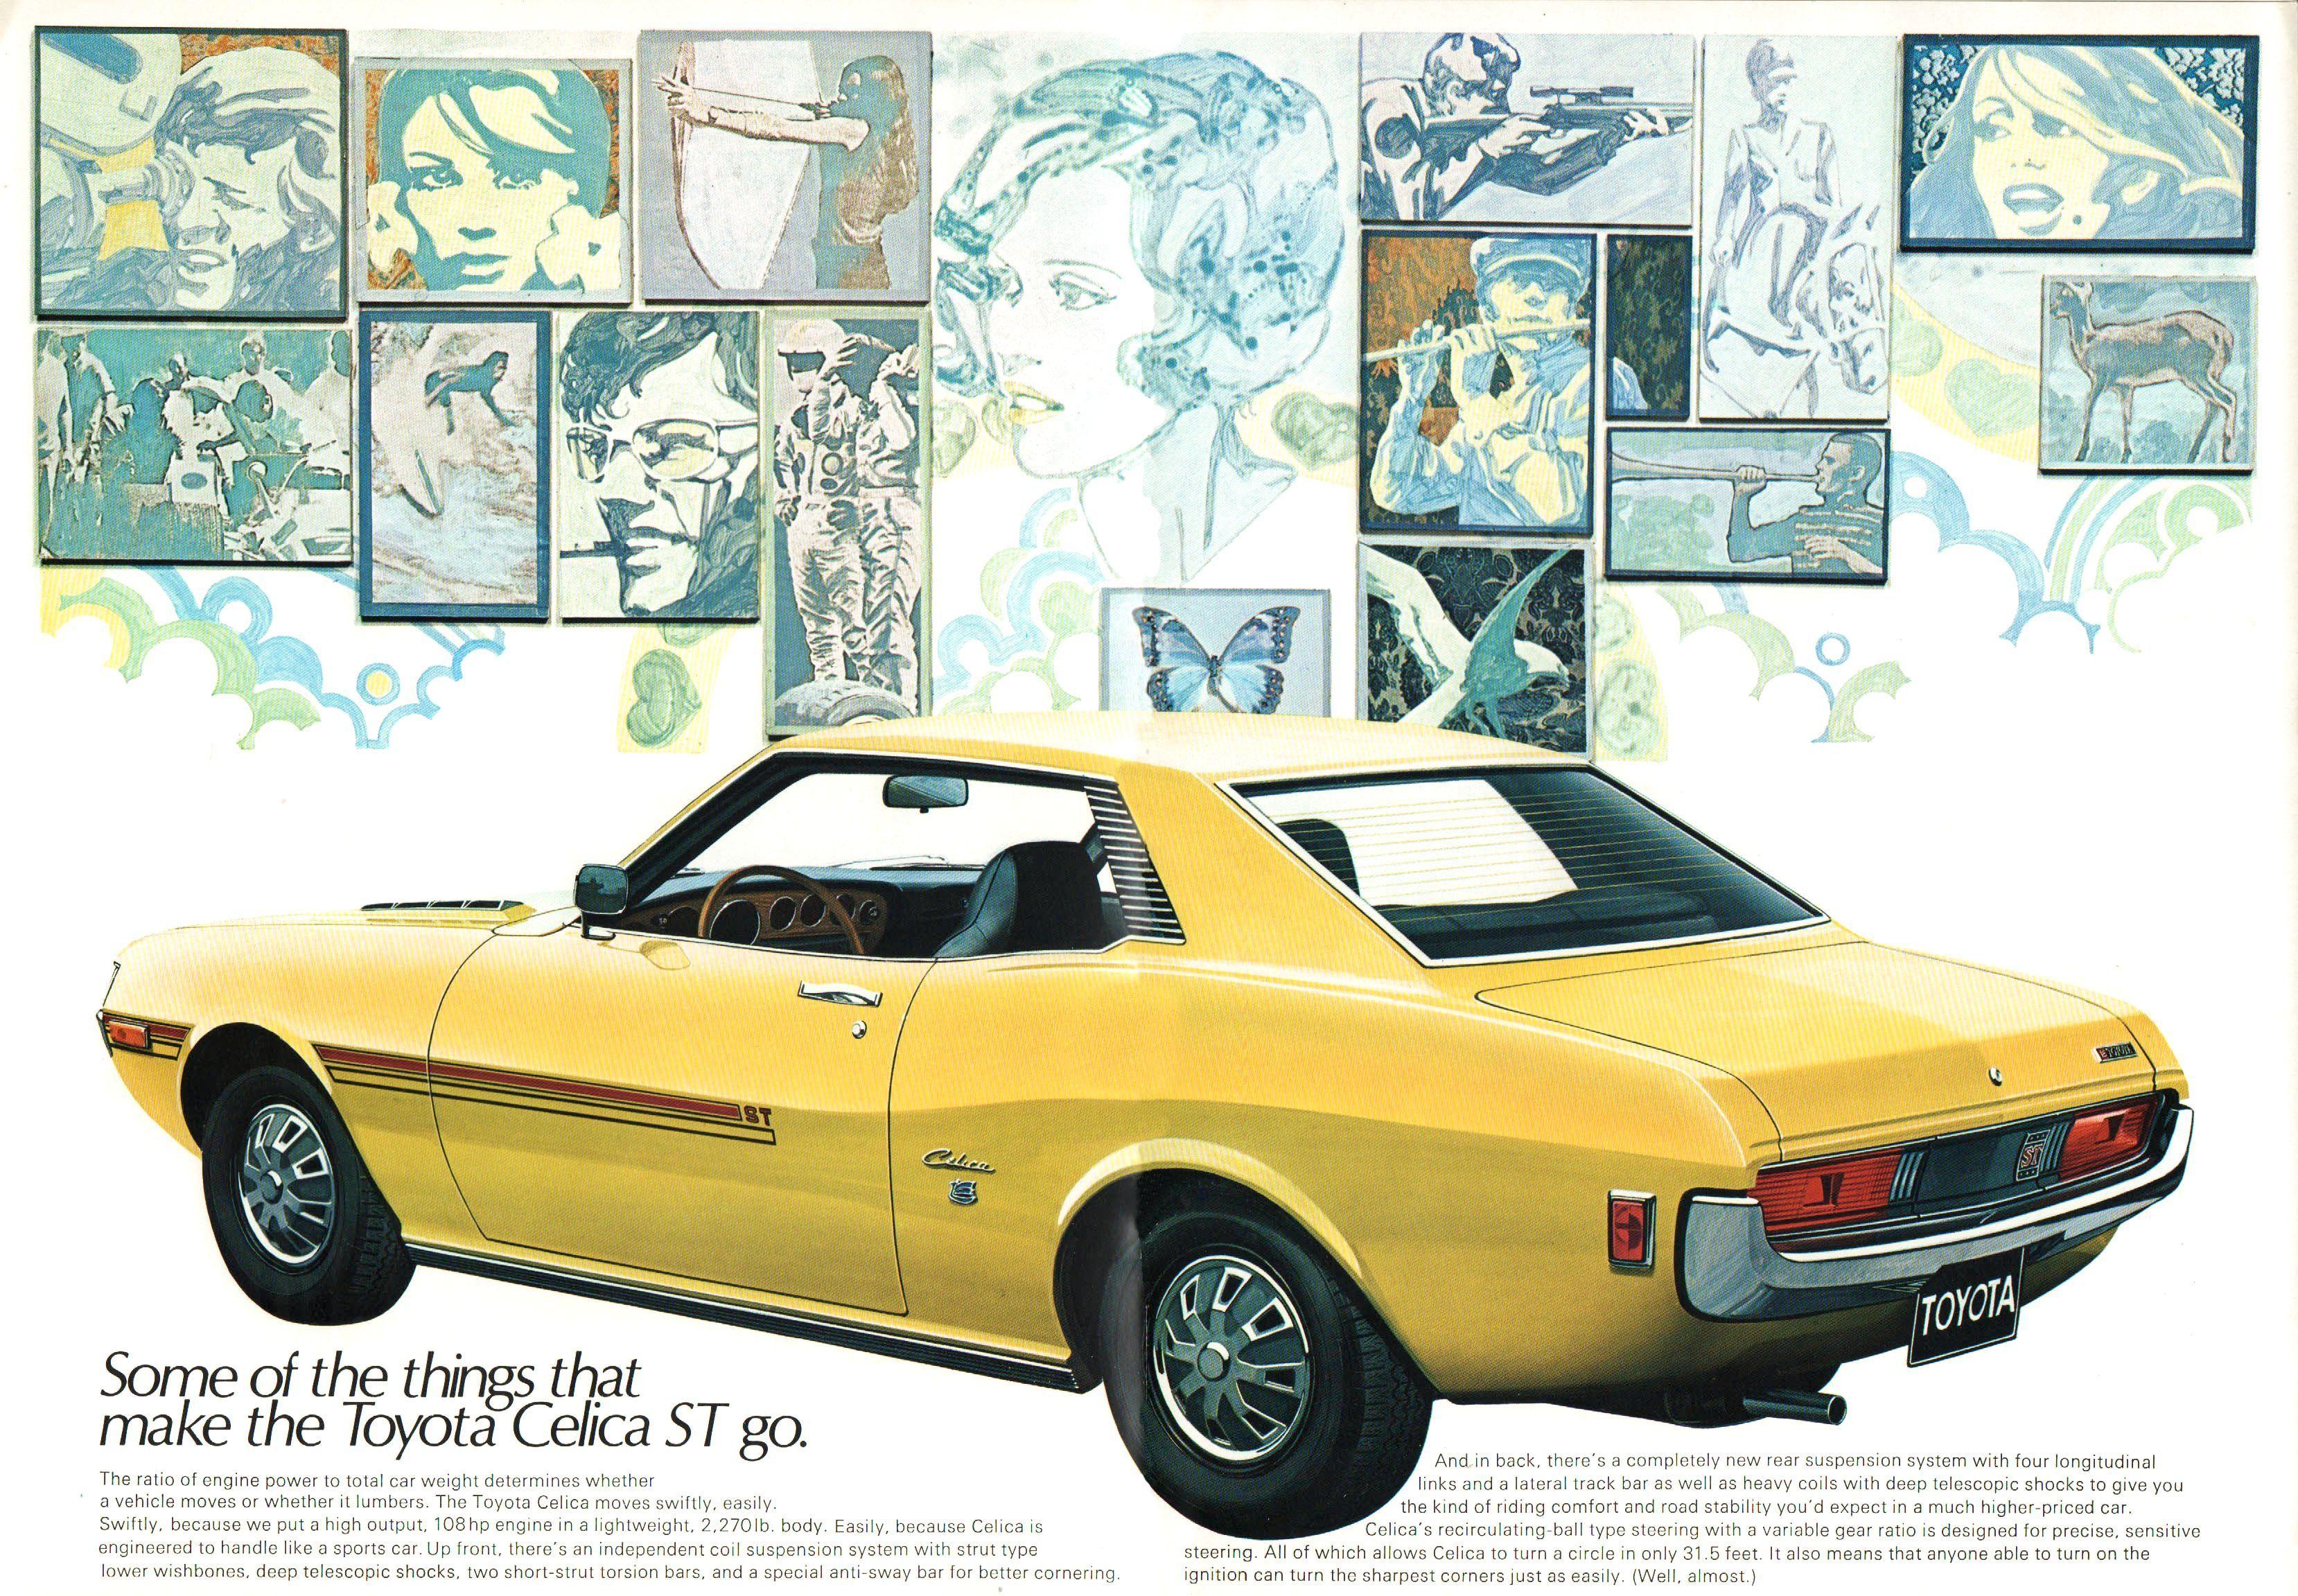 1971 Toyota Celica | Toyota Classic Cars | Pinterest | Toyota celica ...